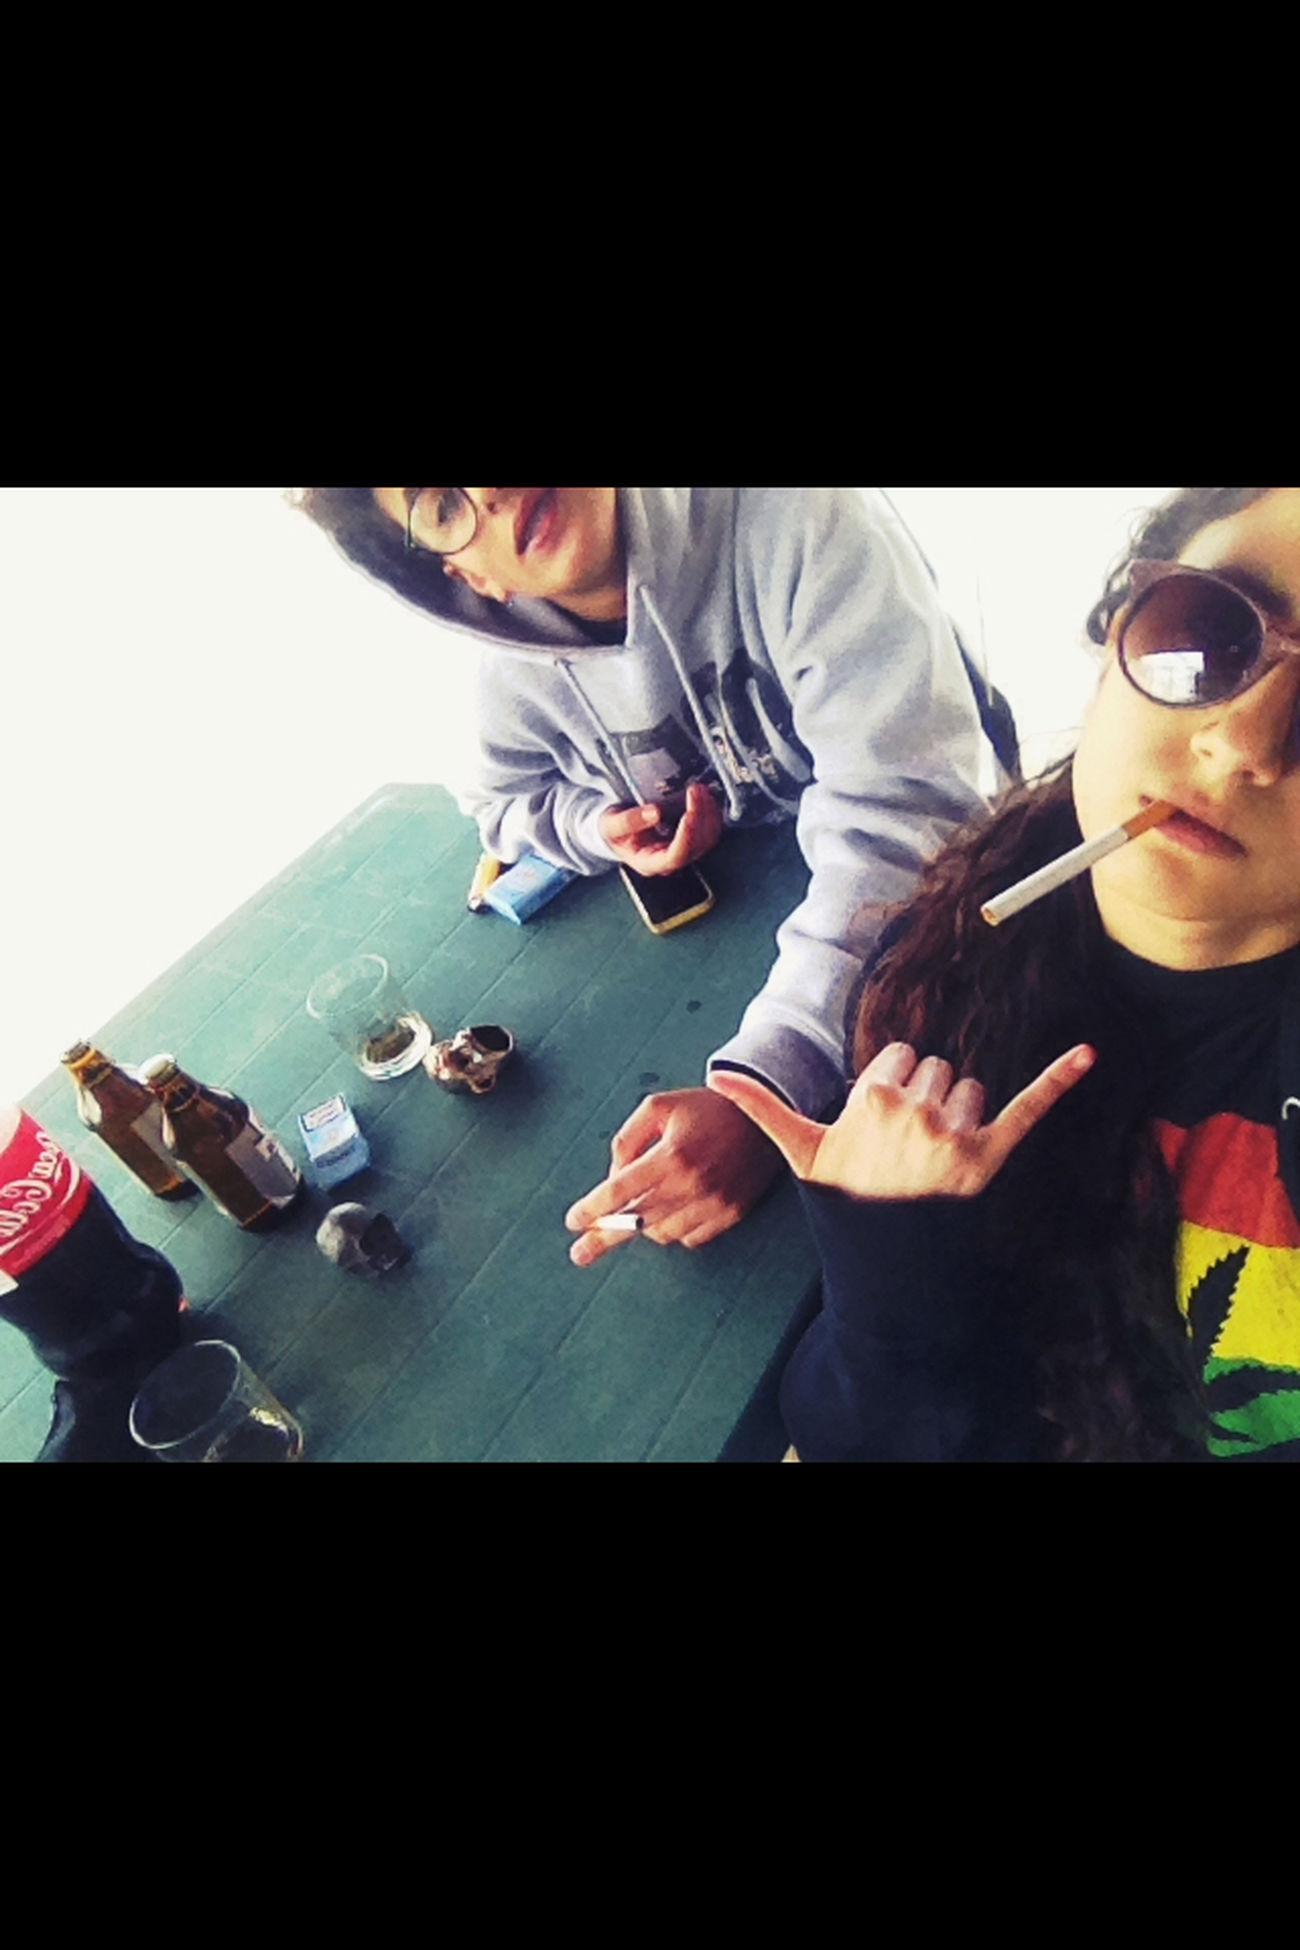 100happydays Day12 Bestfriend Beer Cigarette  Study Coca Camel20 Bulldog Bic